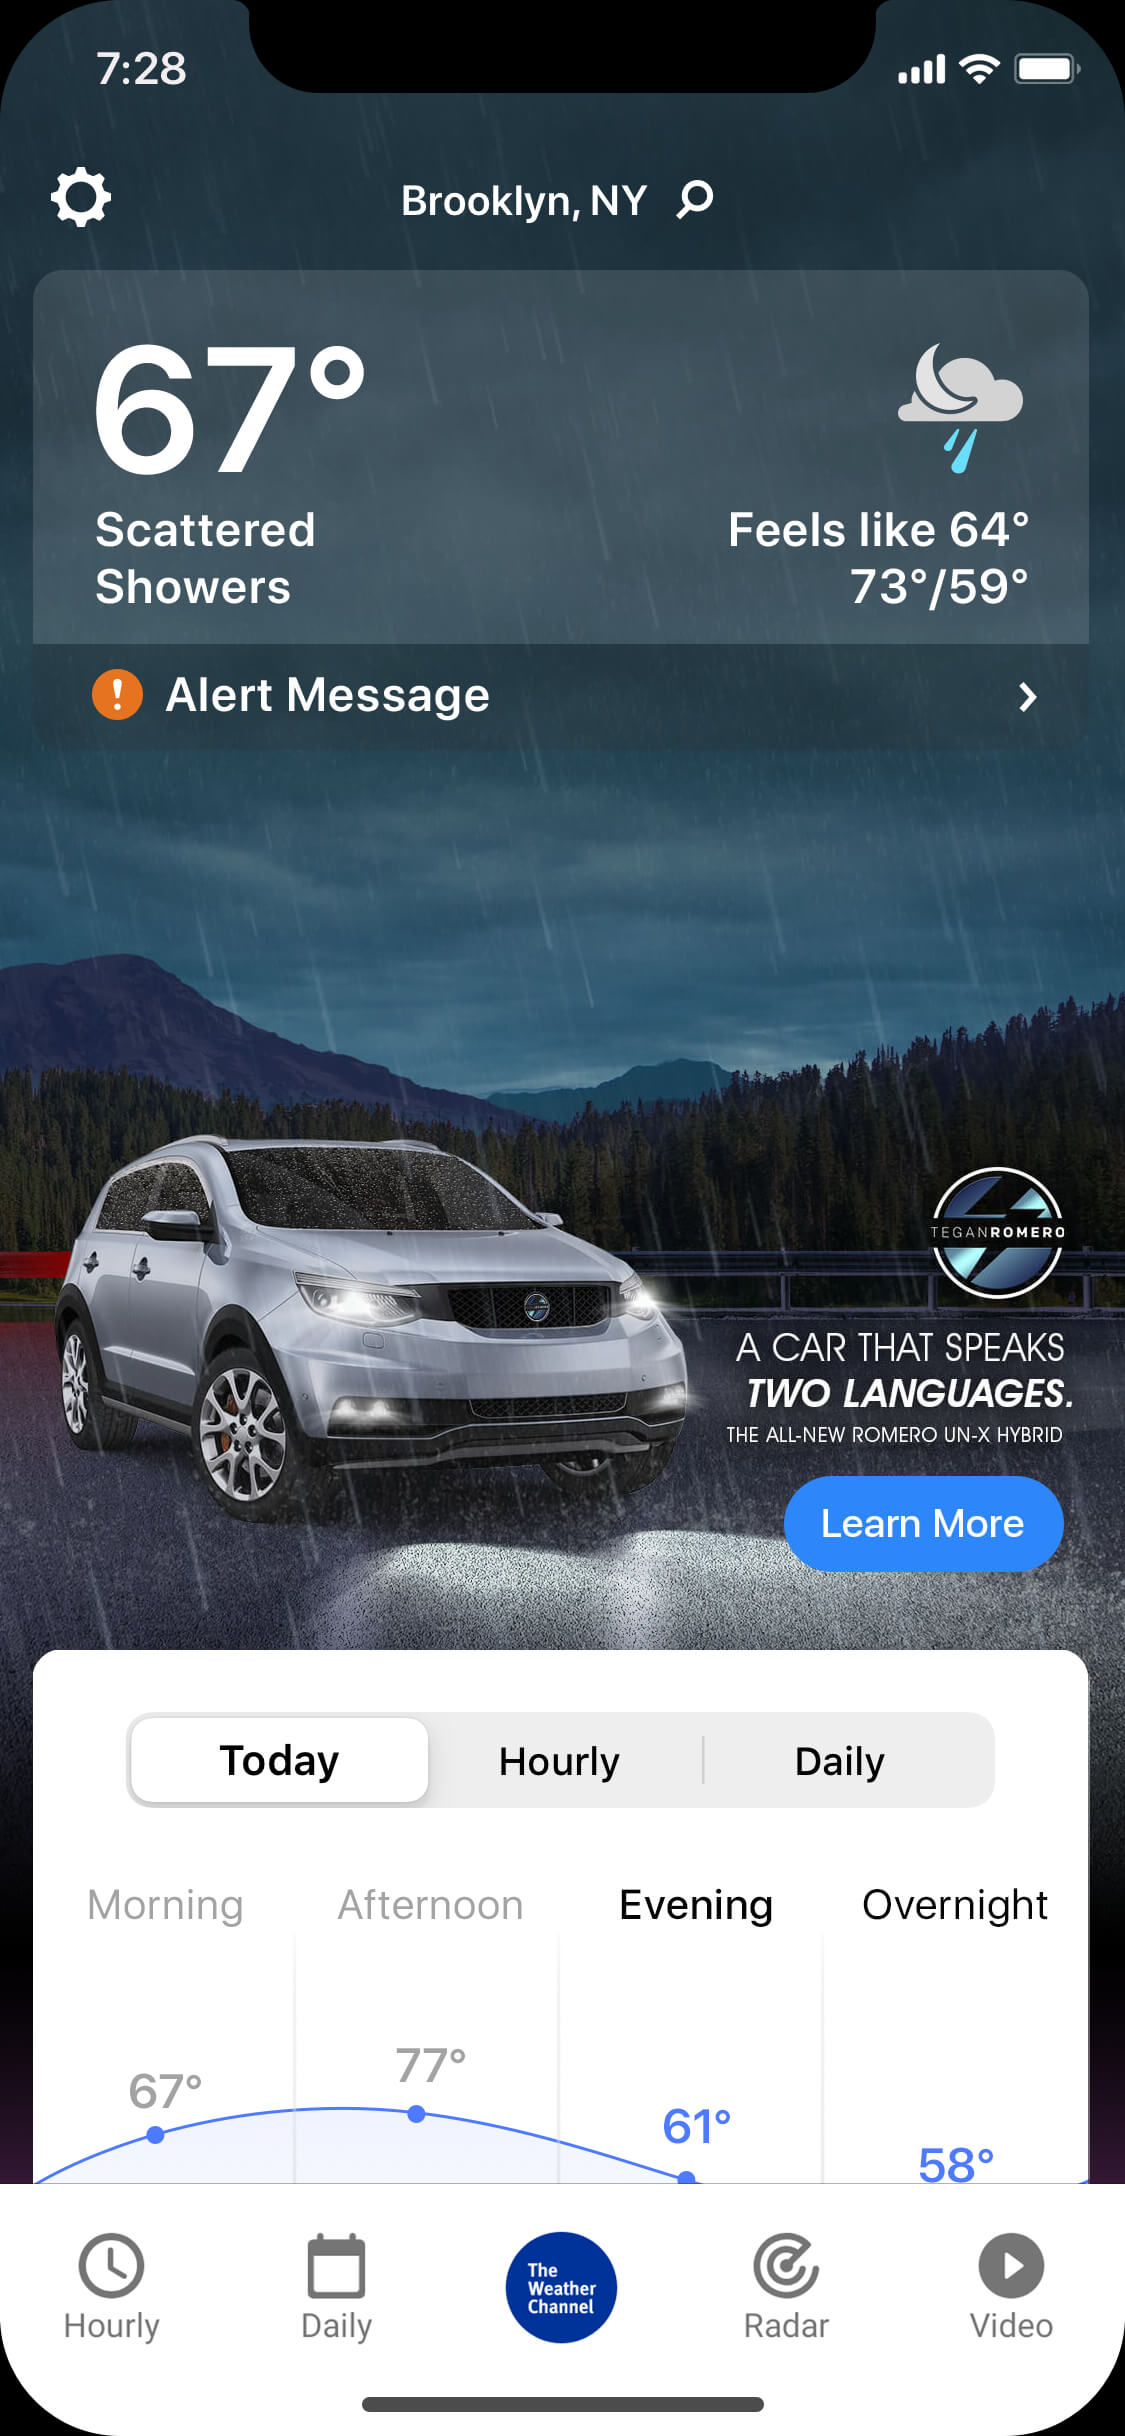 Generic_Automobile-Remero_Hybrid-rainy_night-KILO